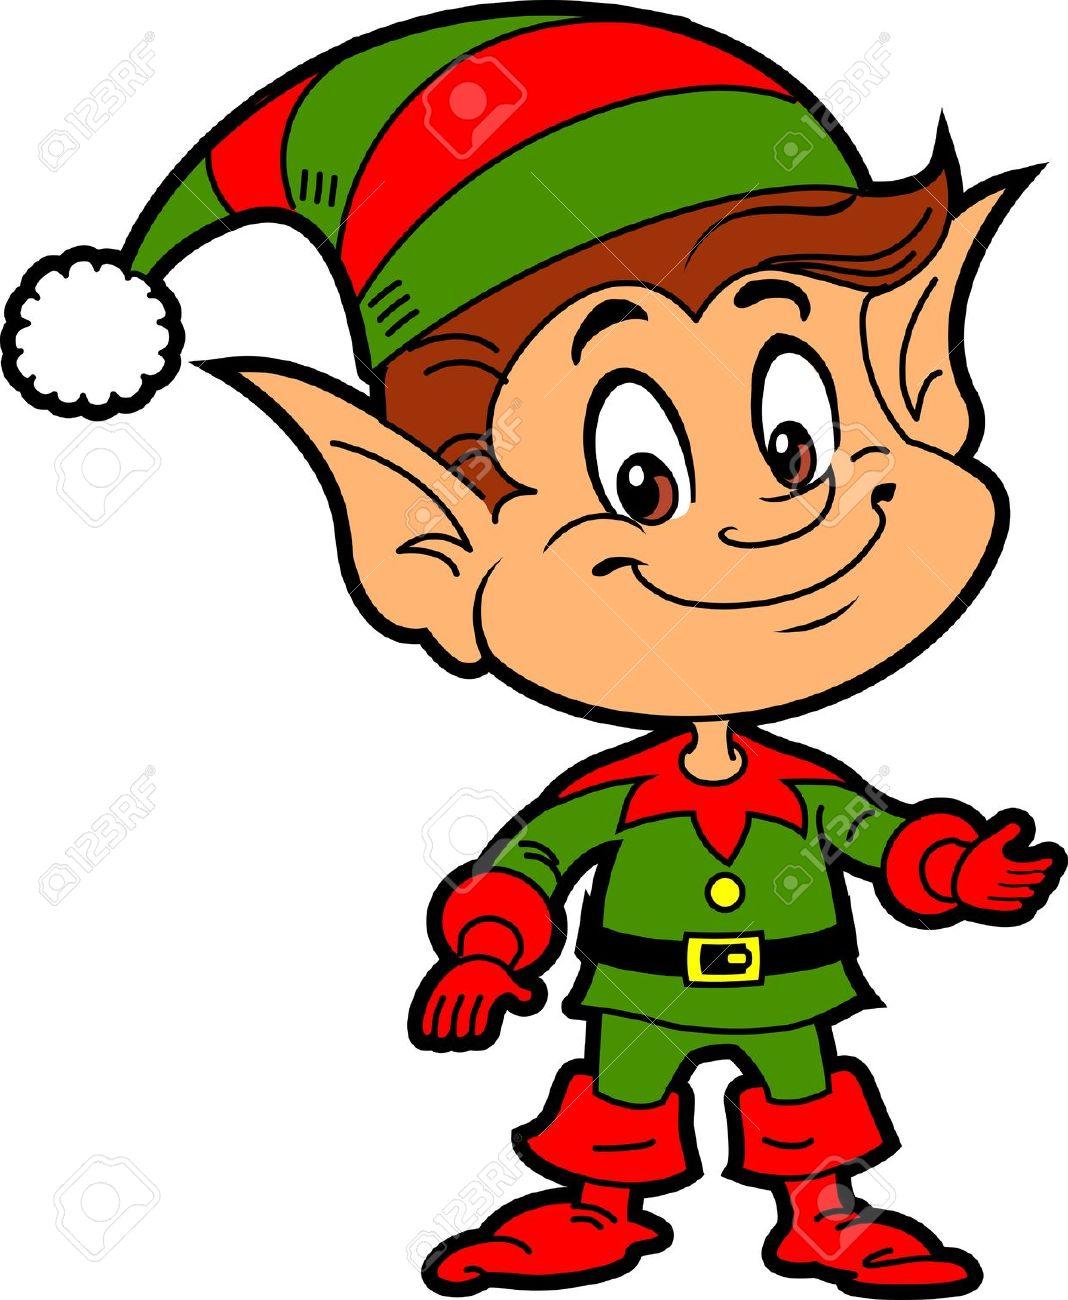 Clipart elves banner Sad Elves Cliparts | Free download best Sad Elves Cliparts on ... banner